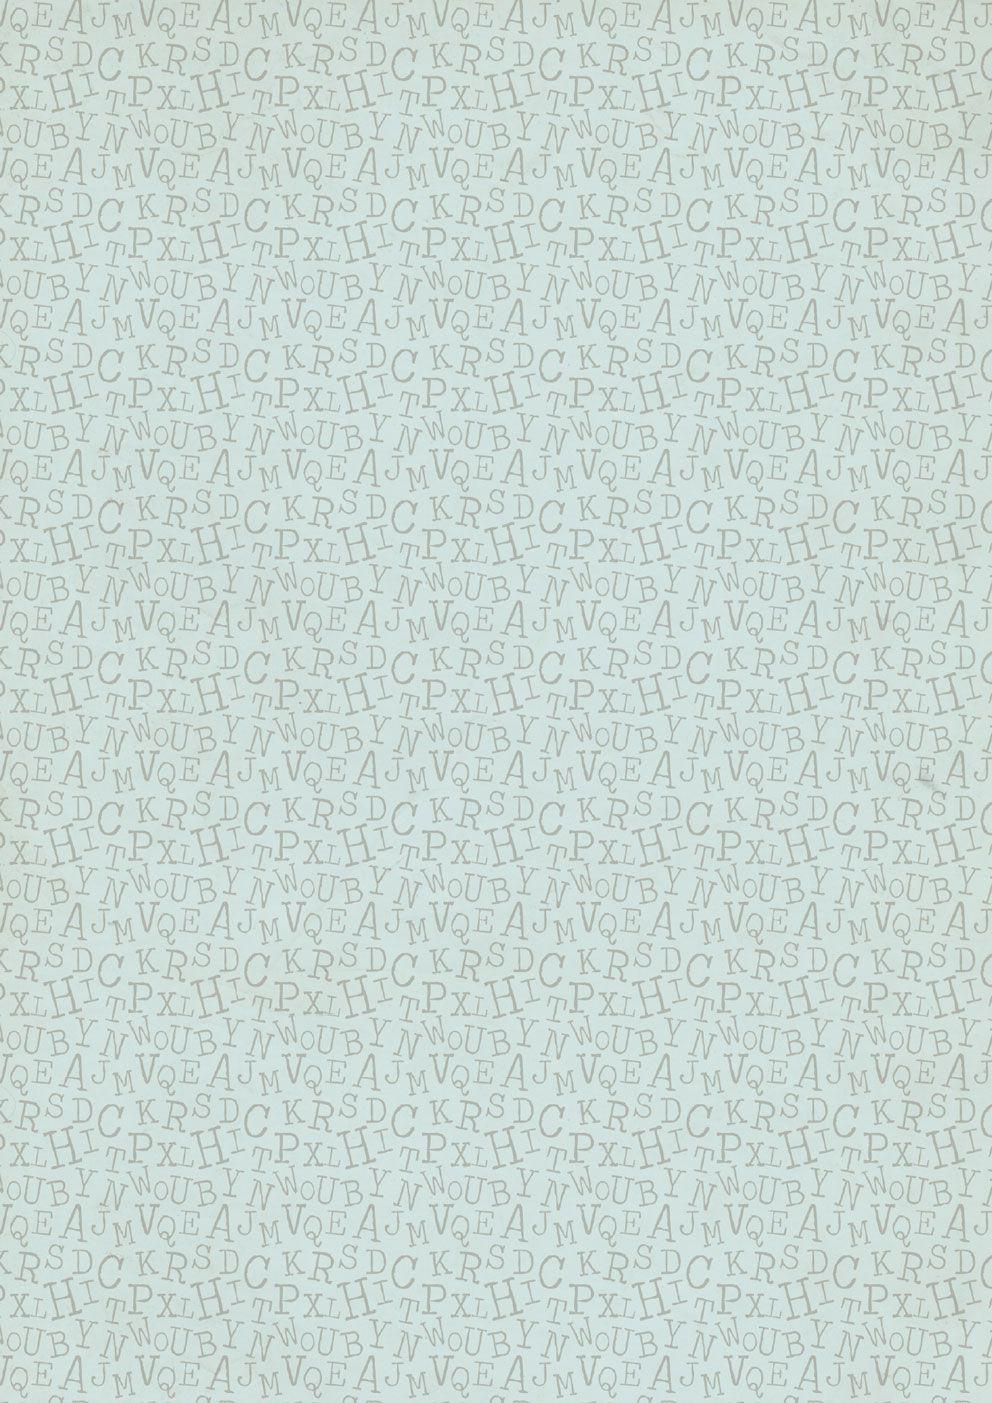 Bloco de Folhas A4 - Quarentena Criativa - JuJu Scrapbook  - JuJu Scrapbook